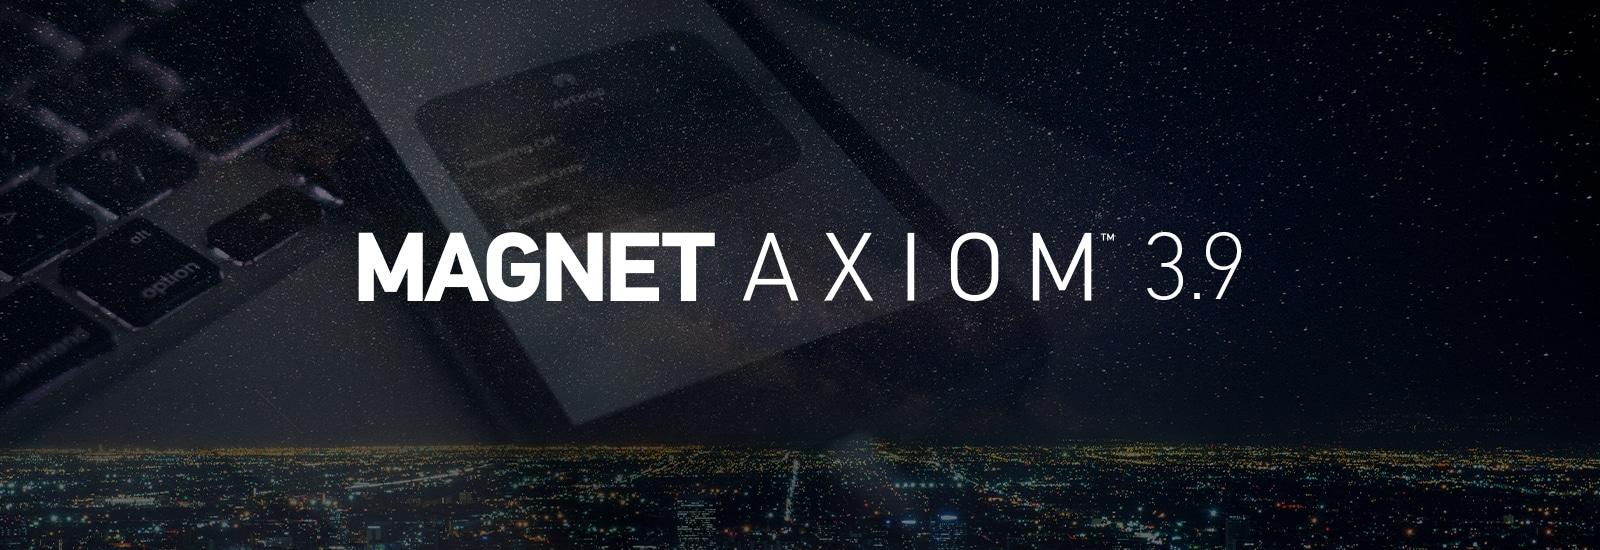 Magnet AXIOM 3.9